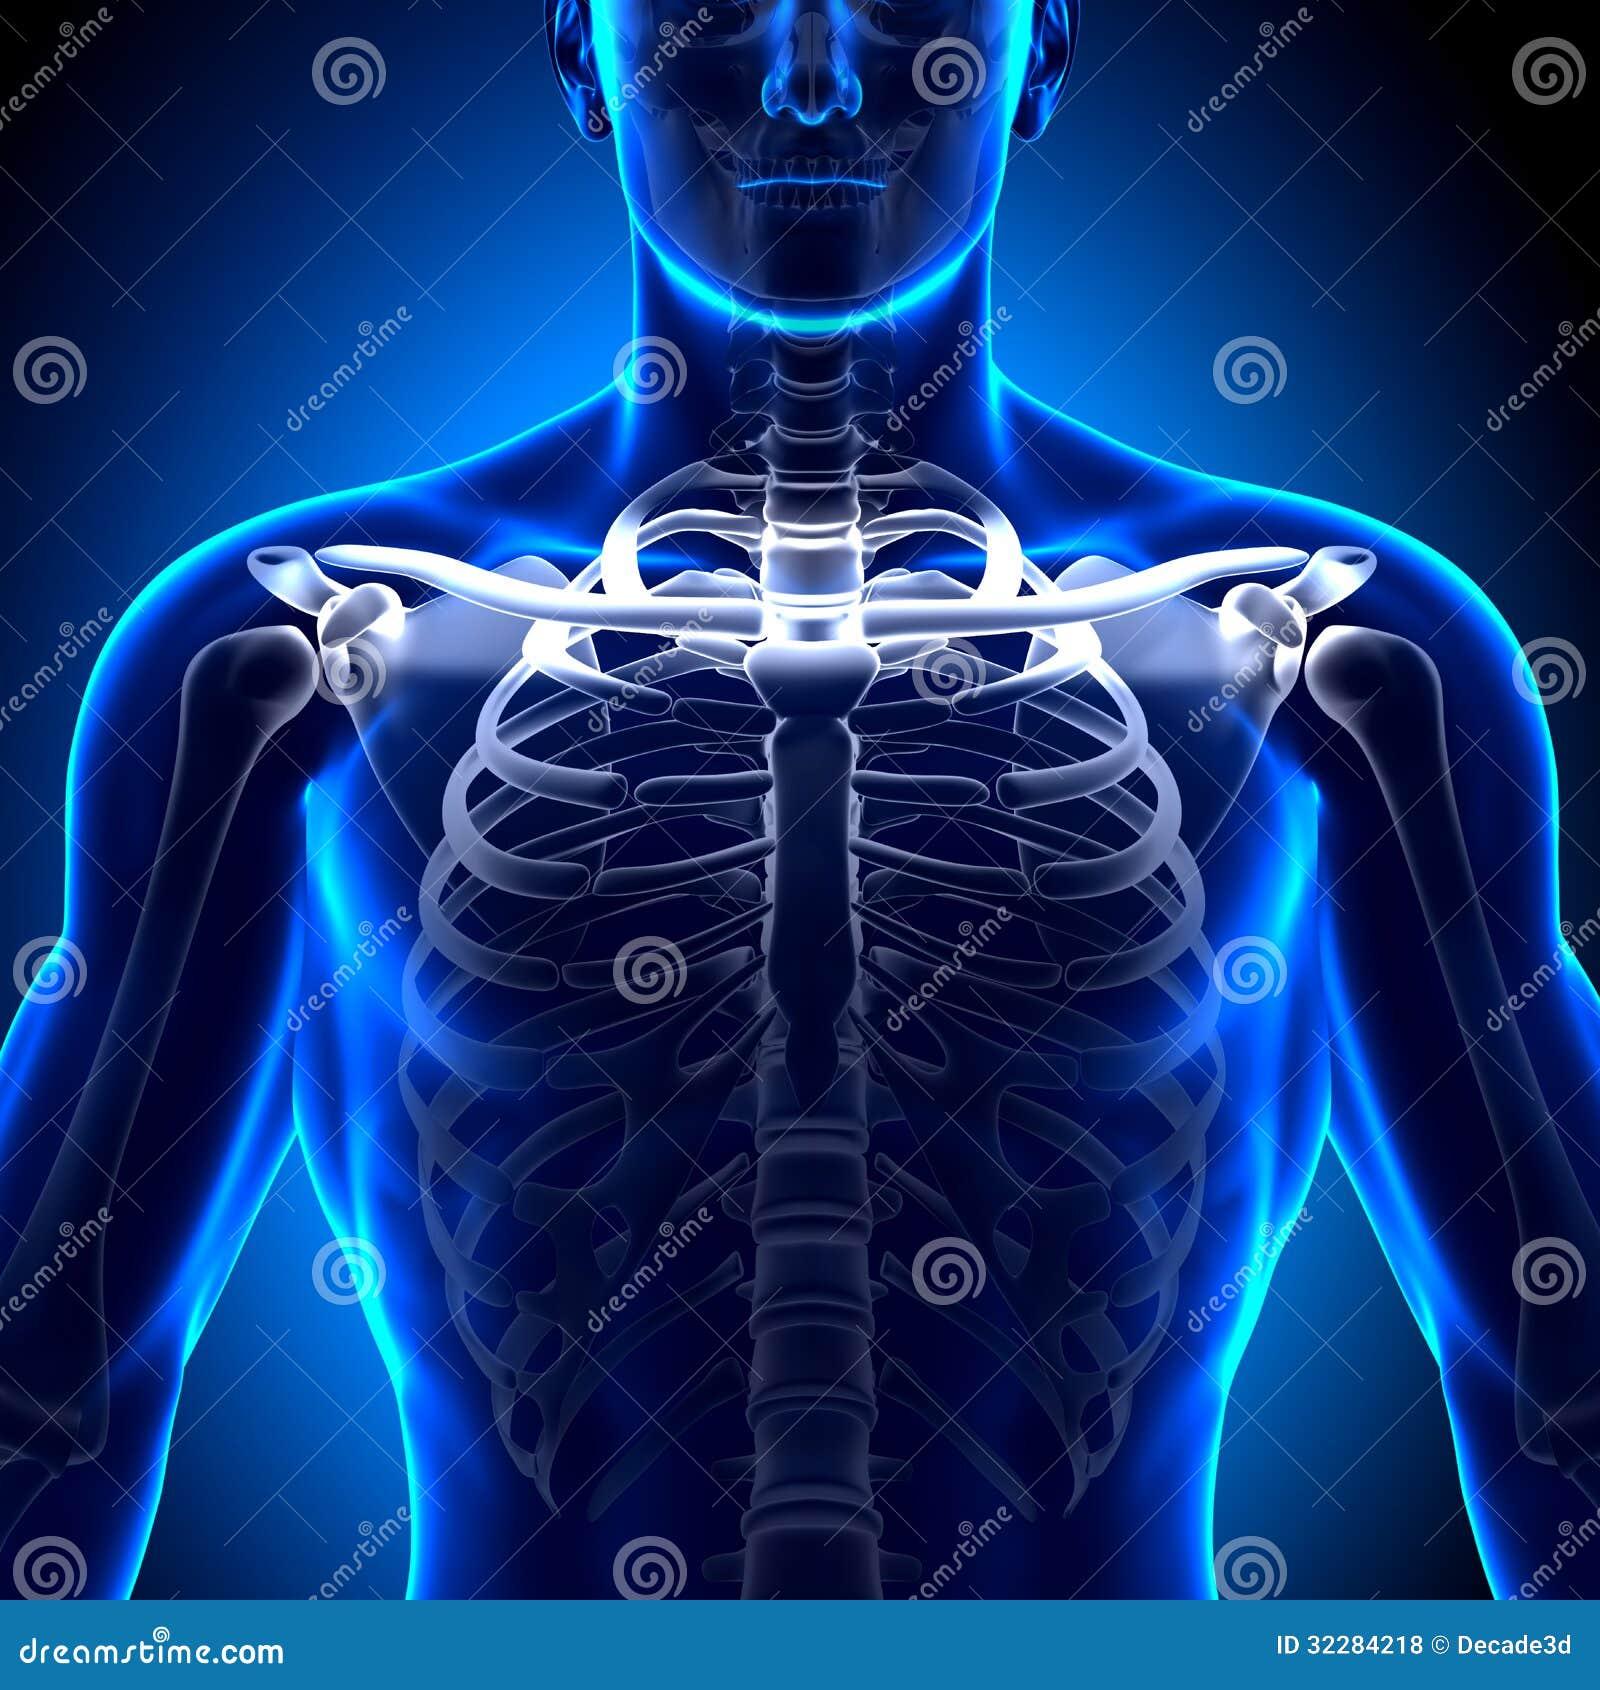 Radiology and collar bone cracker